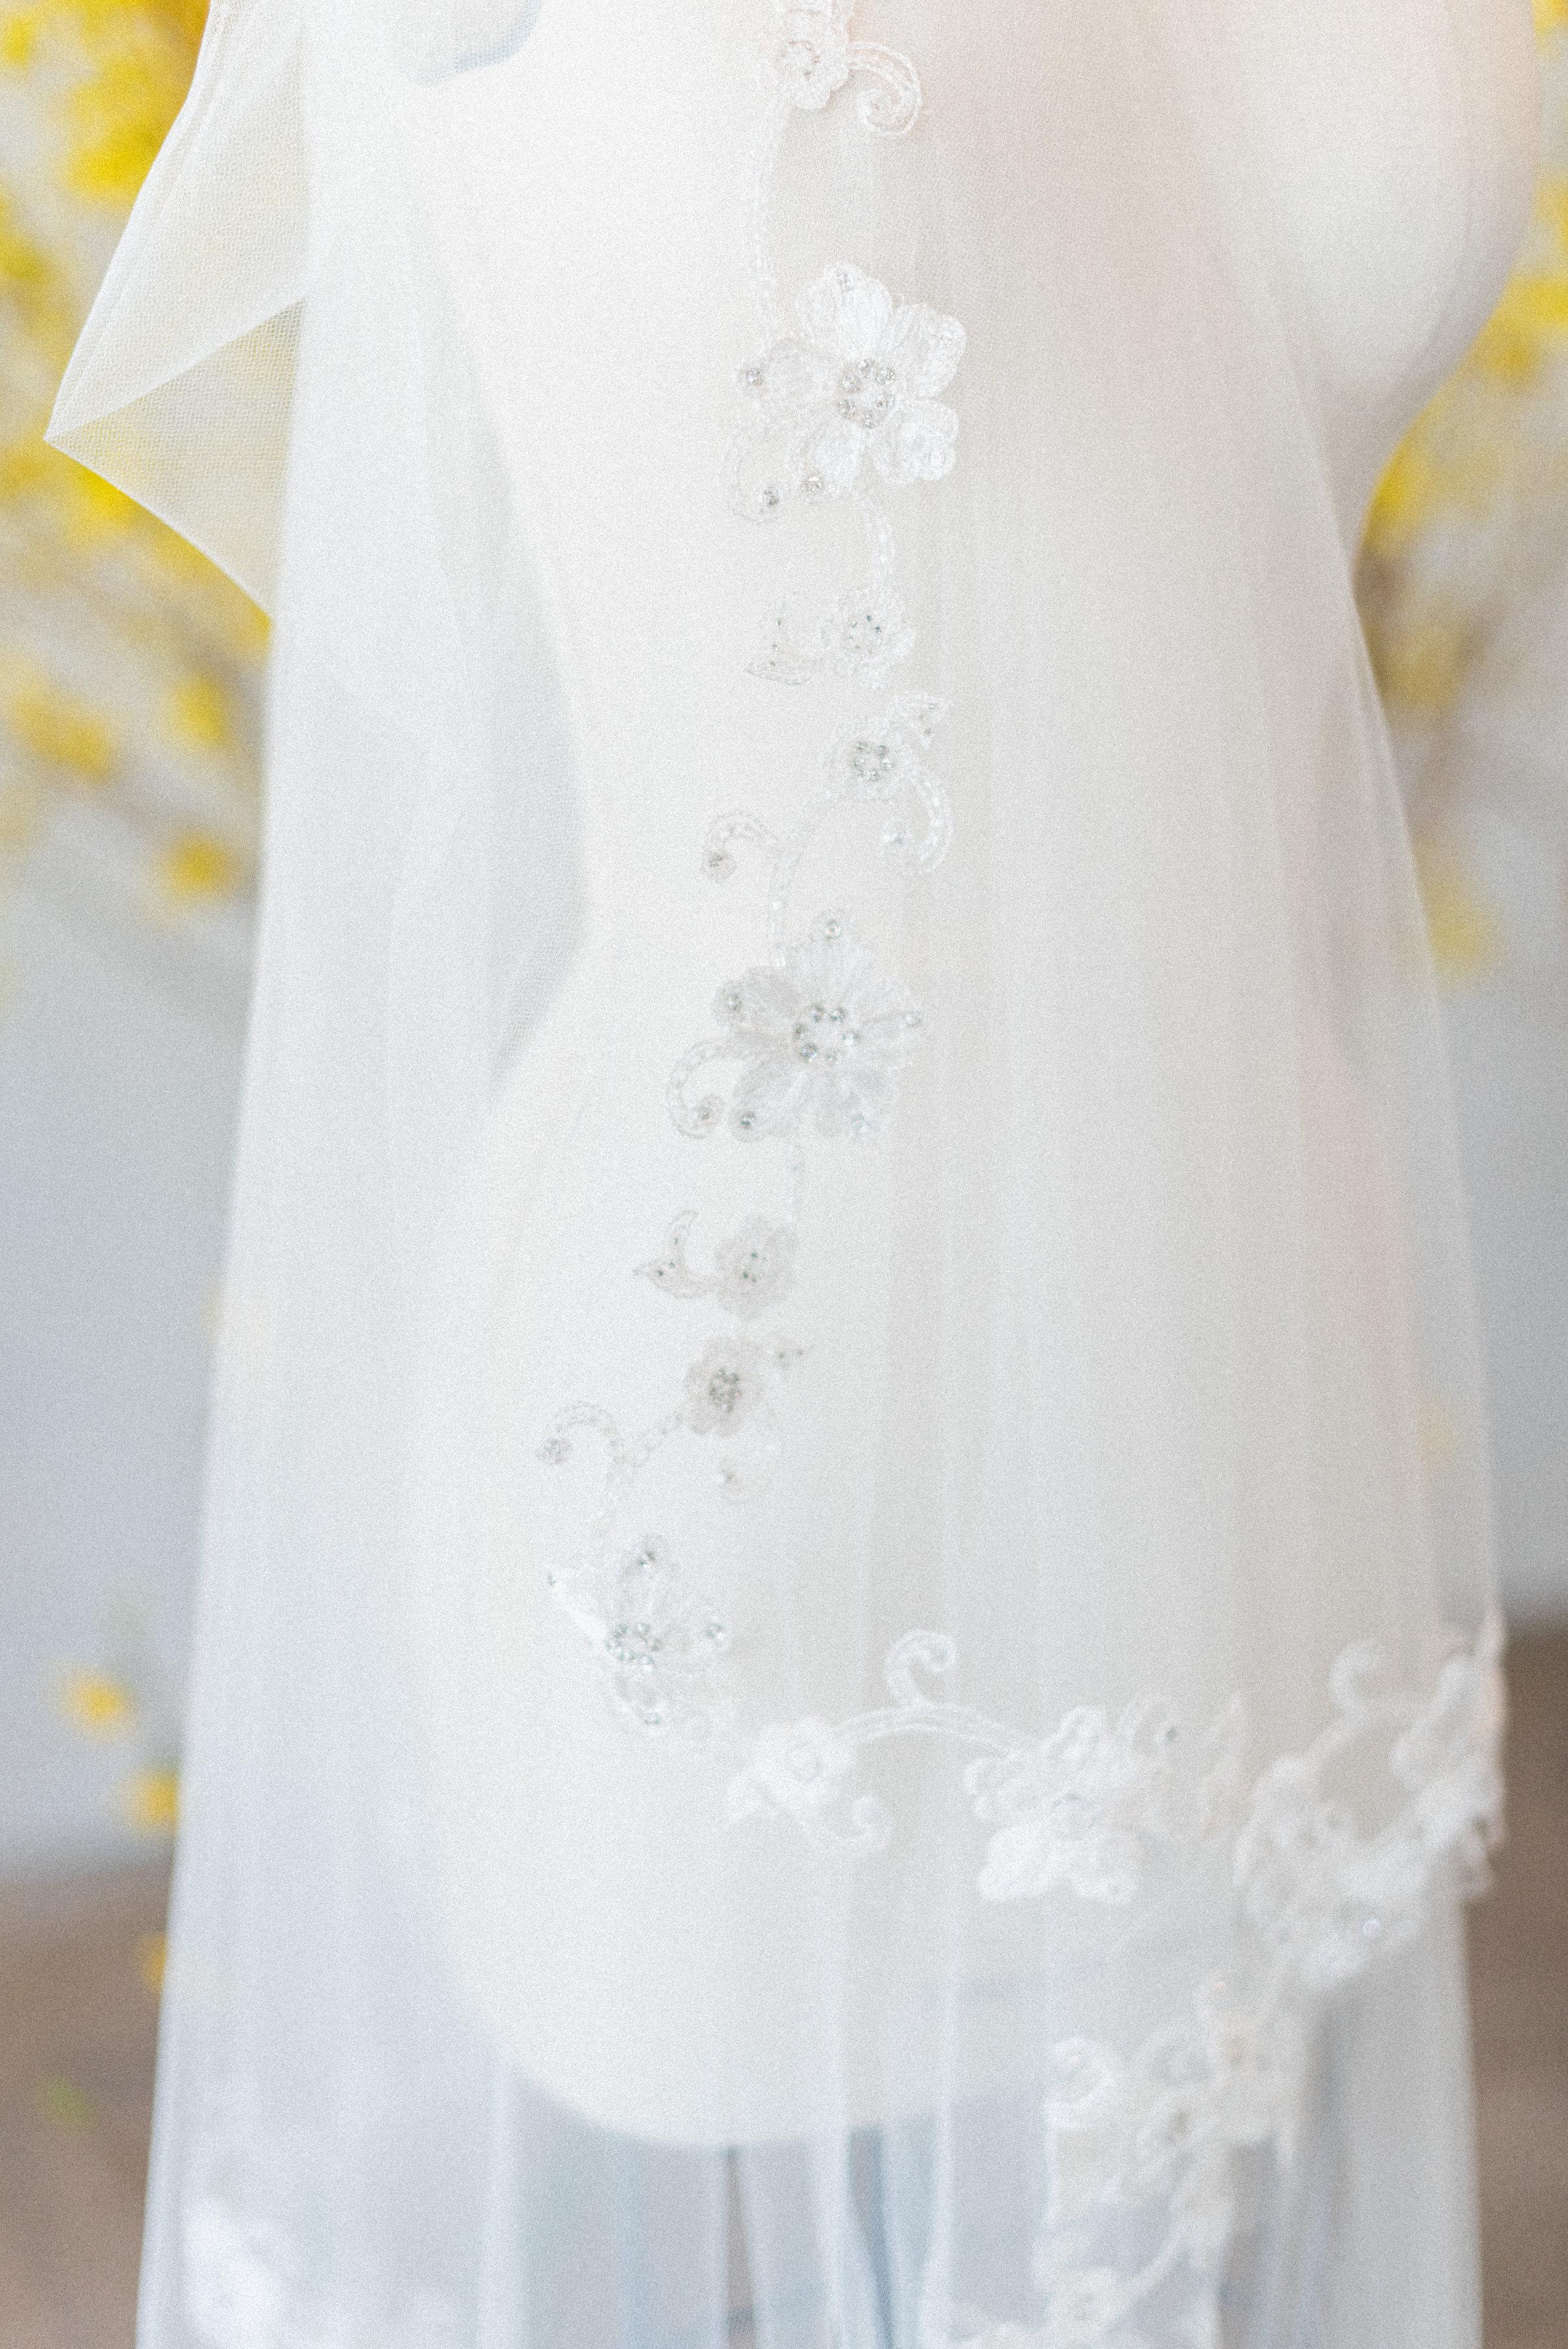 Claire Pettibone Heirloom veil | Spring Bridal Inspiration from Little White Dress Bridal Shop in Denver, Colorado | Decorus Photography